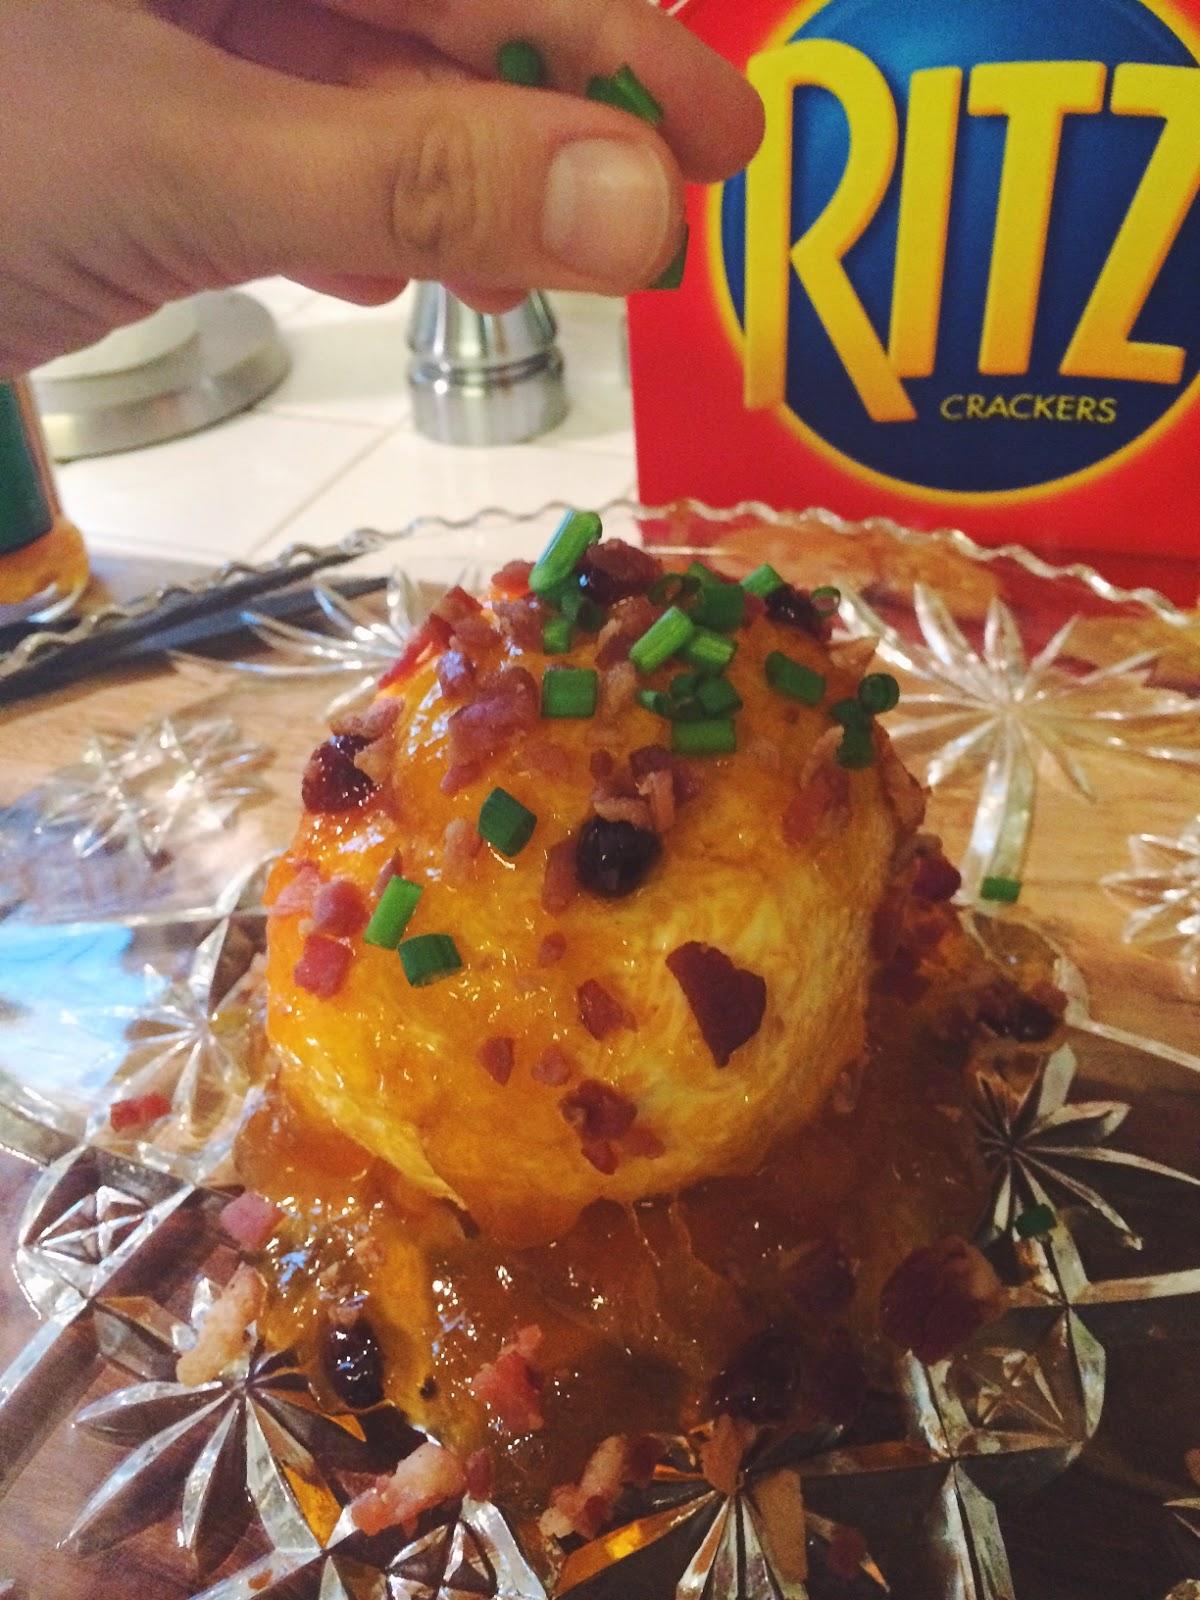 Chutney Bacon Green Onion Cheese Ball Recipe Trendy in Texas